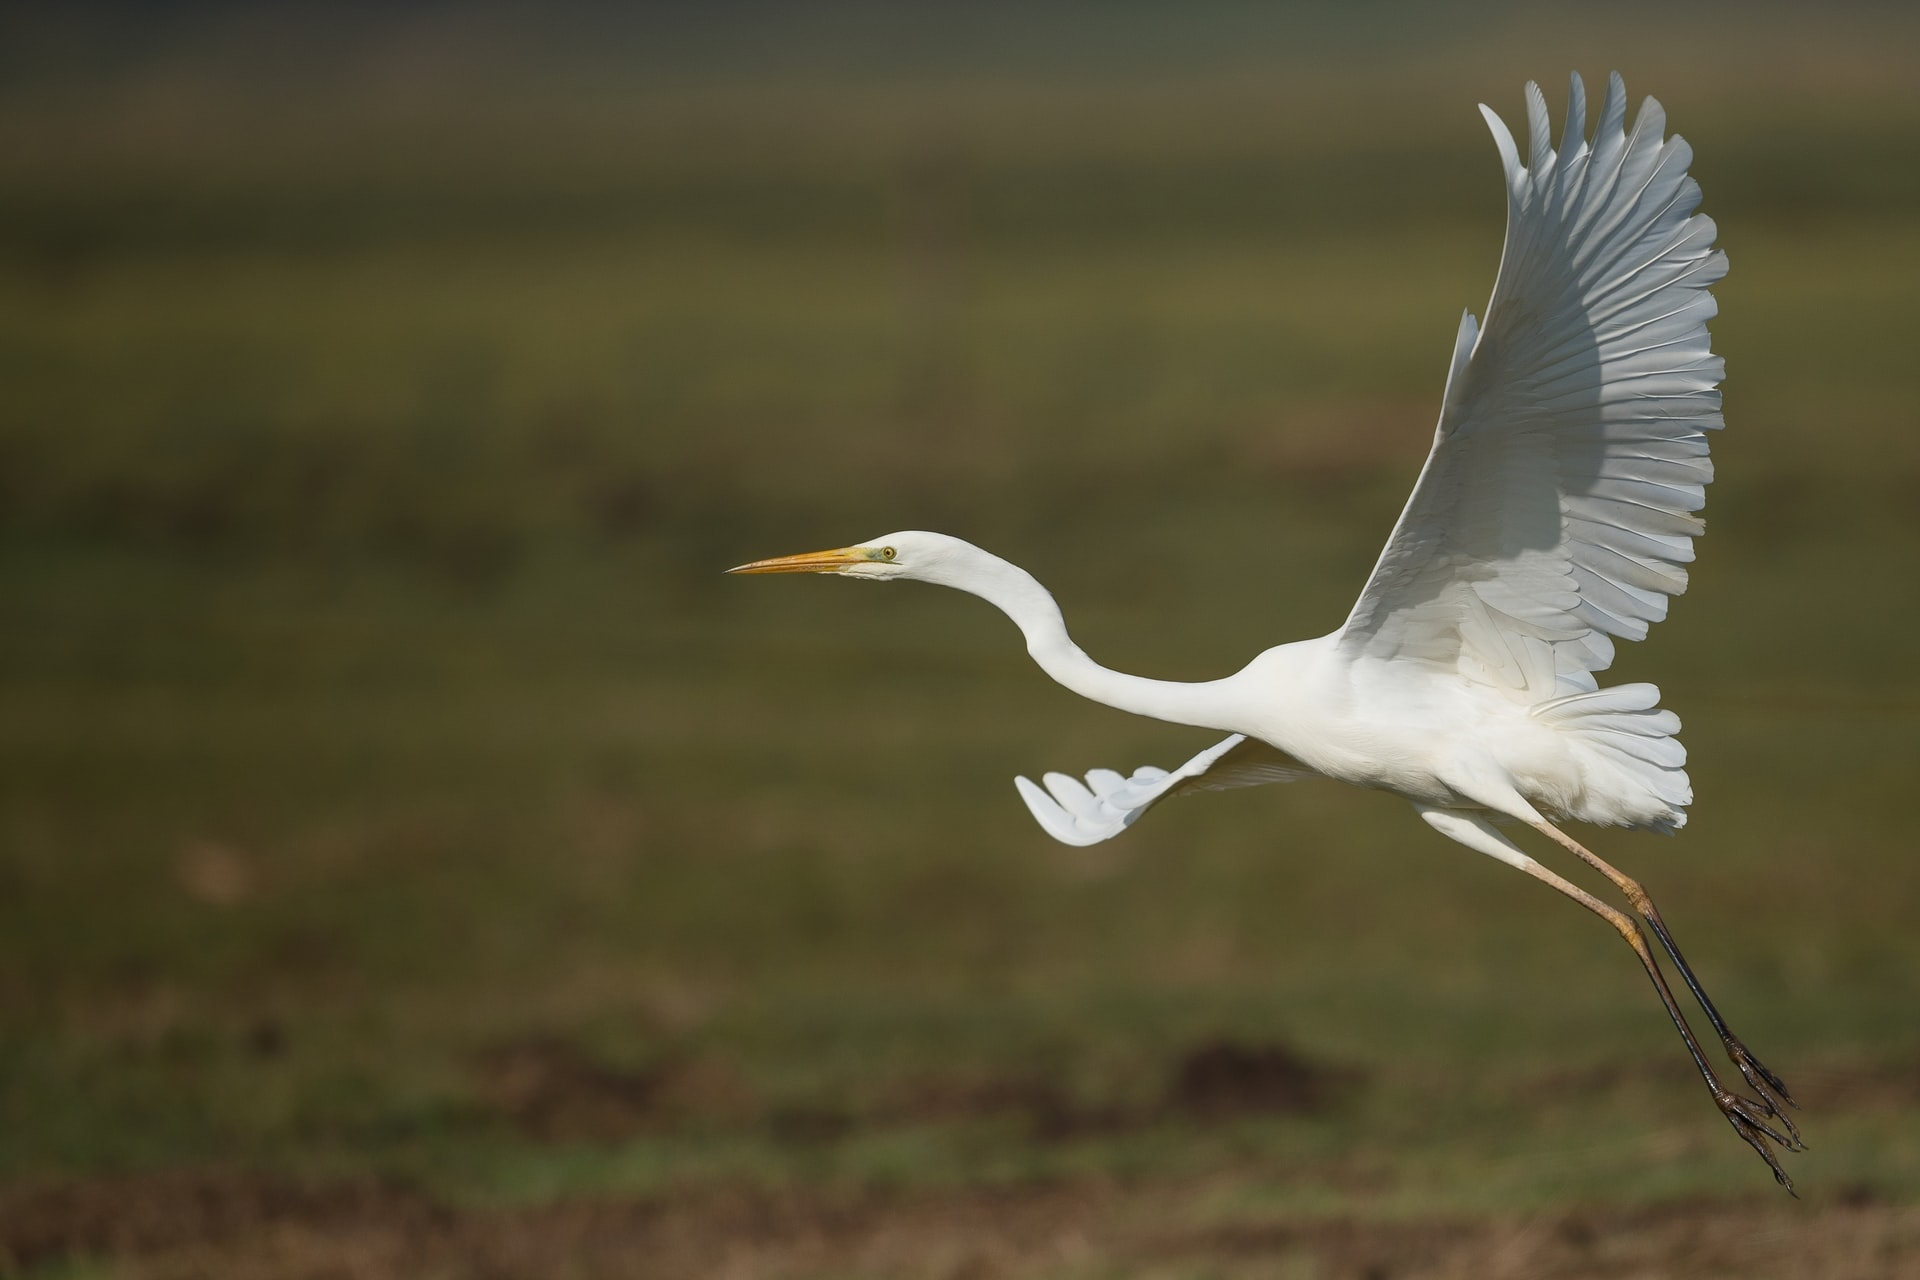 Keep Your Eyes Peeled for Local Wildlife at Wakodahatchee Wetlands